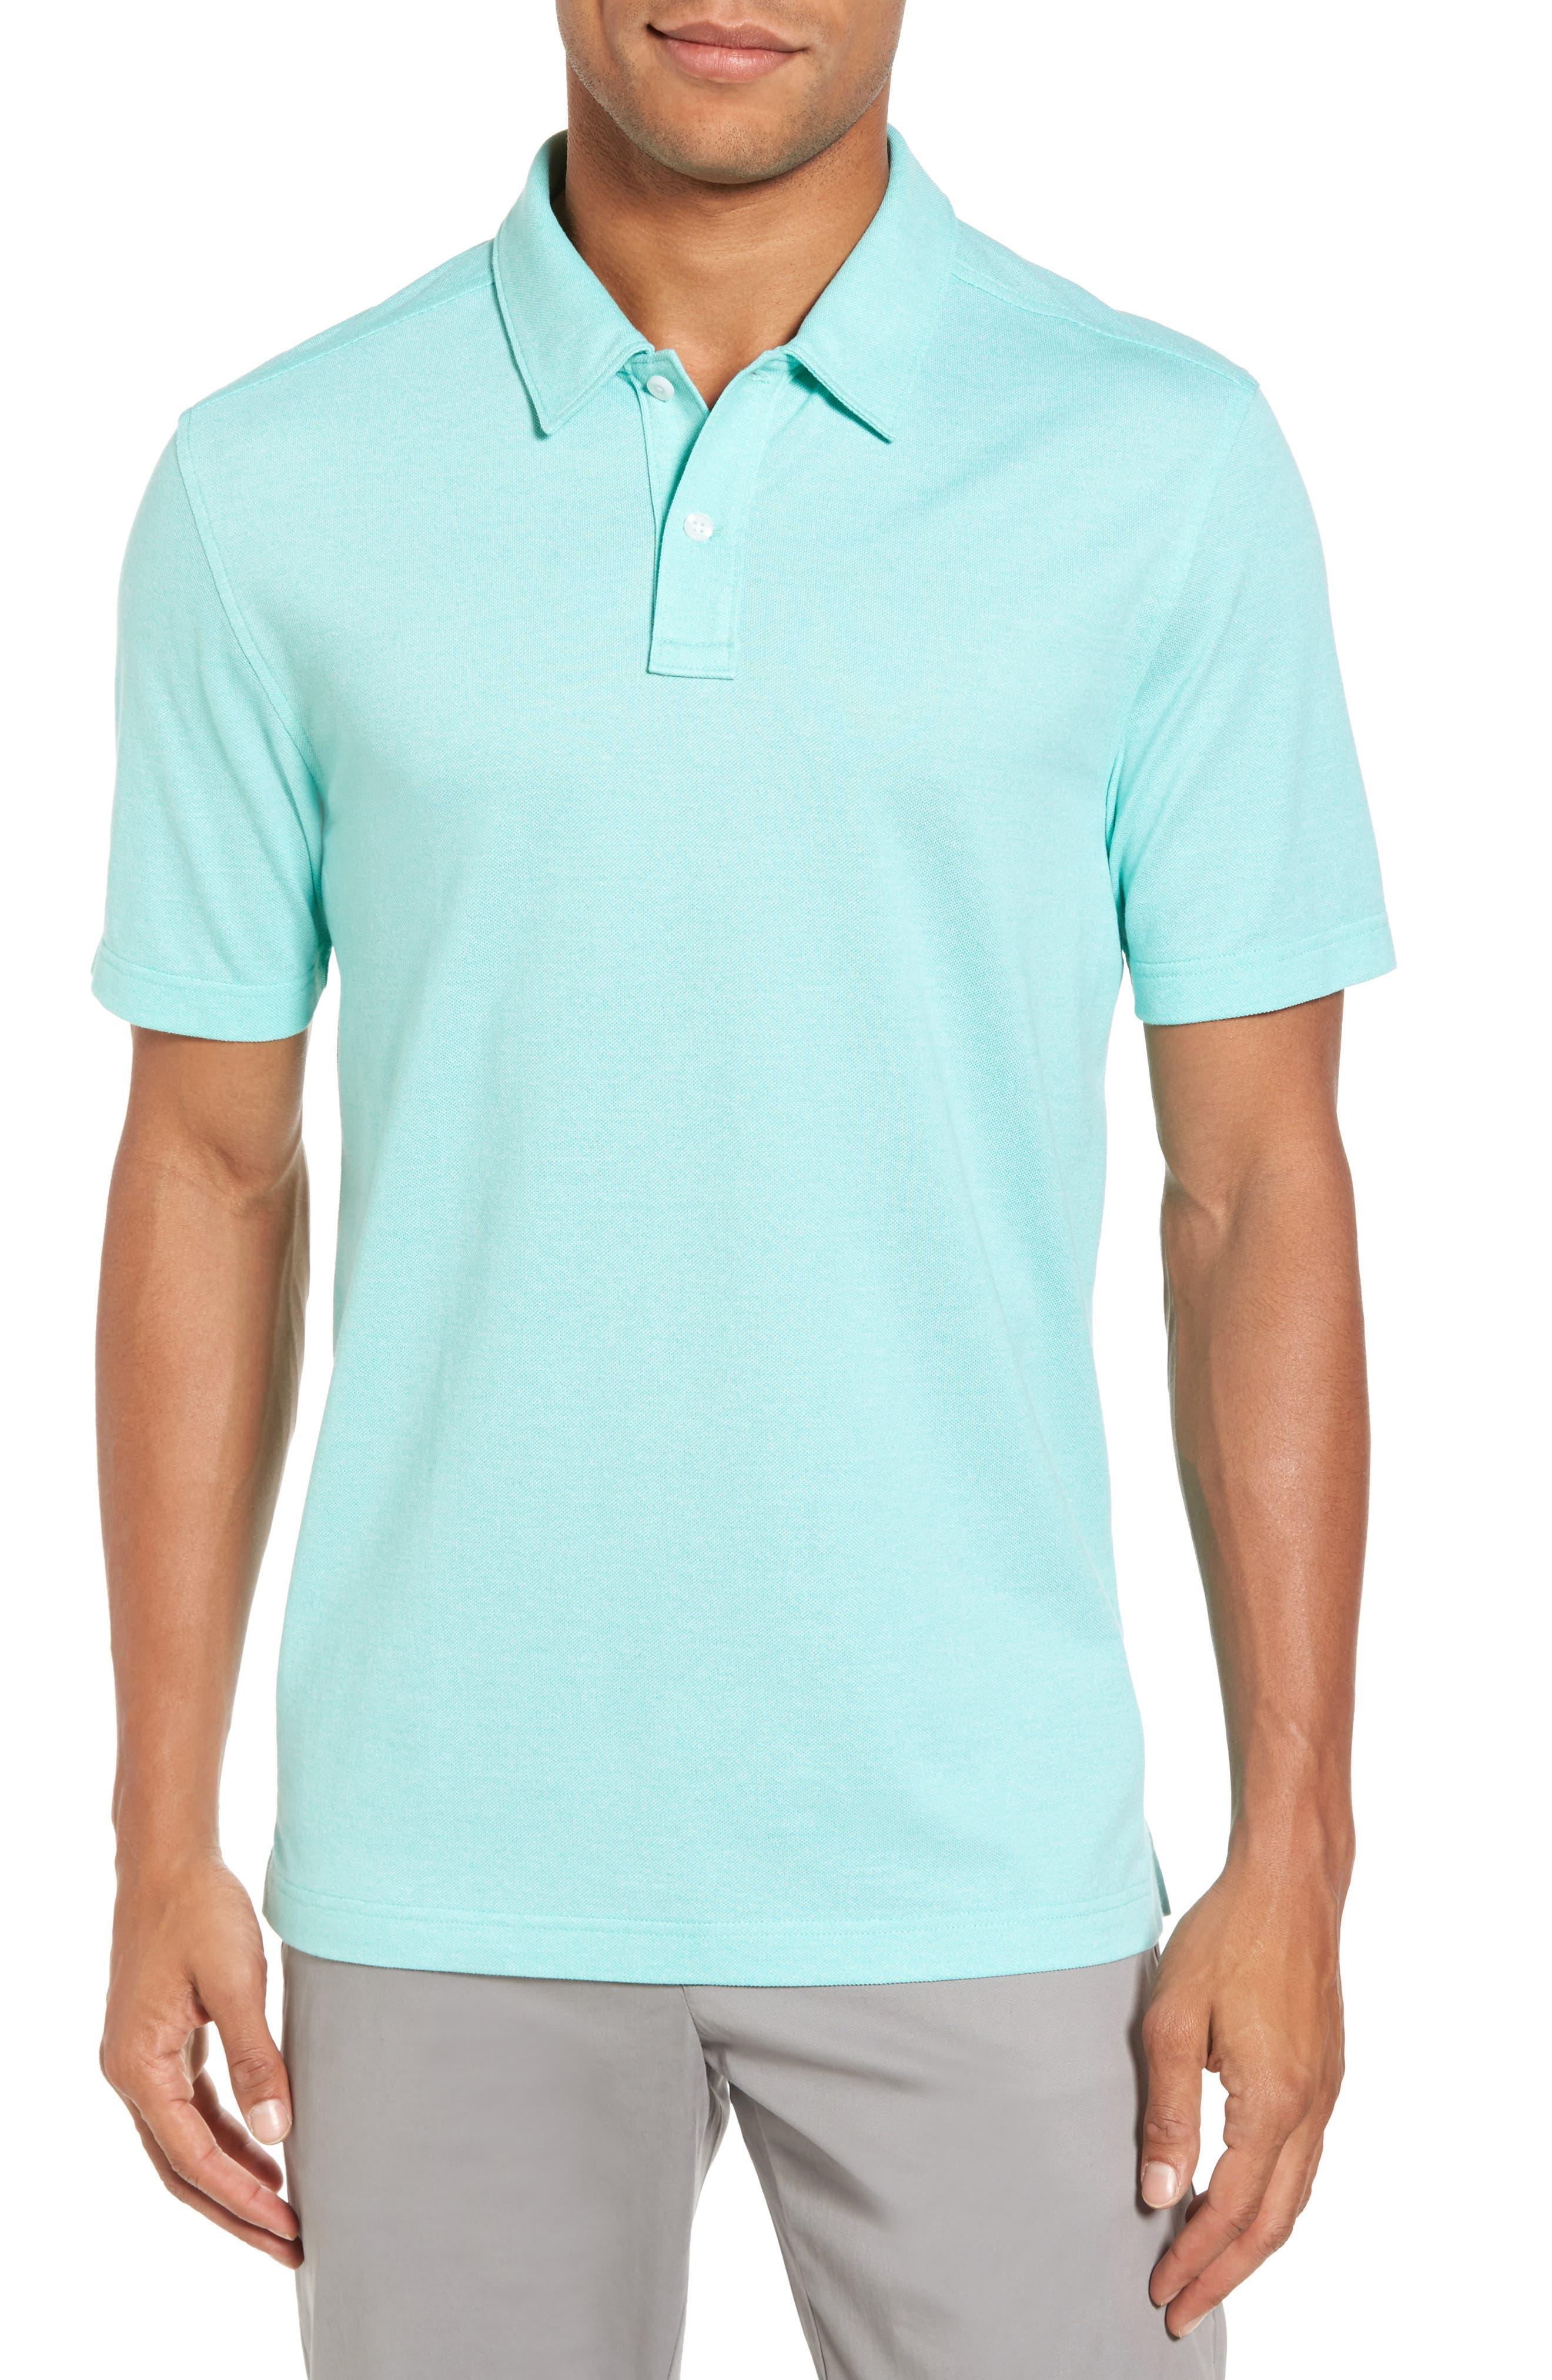 Nordstrom Shop Regular Fit Polo, Blue/green